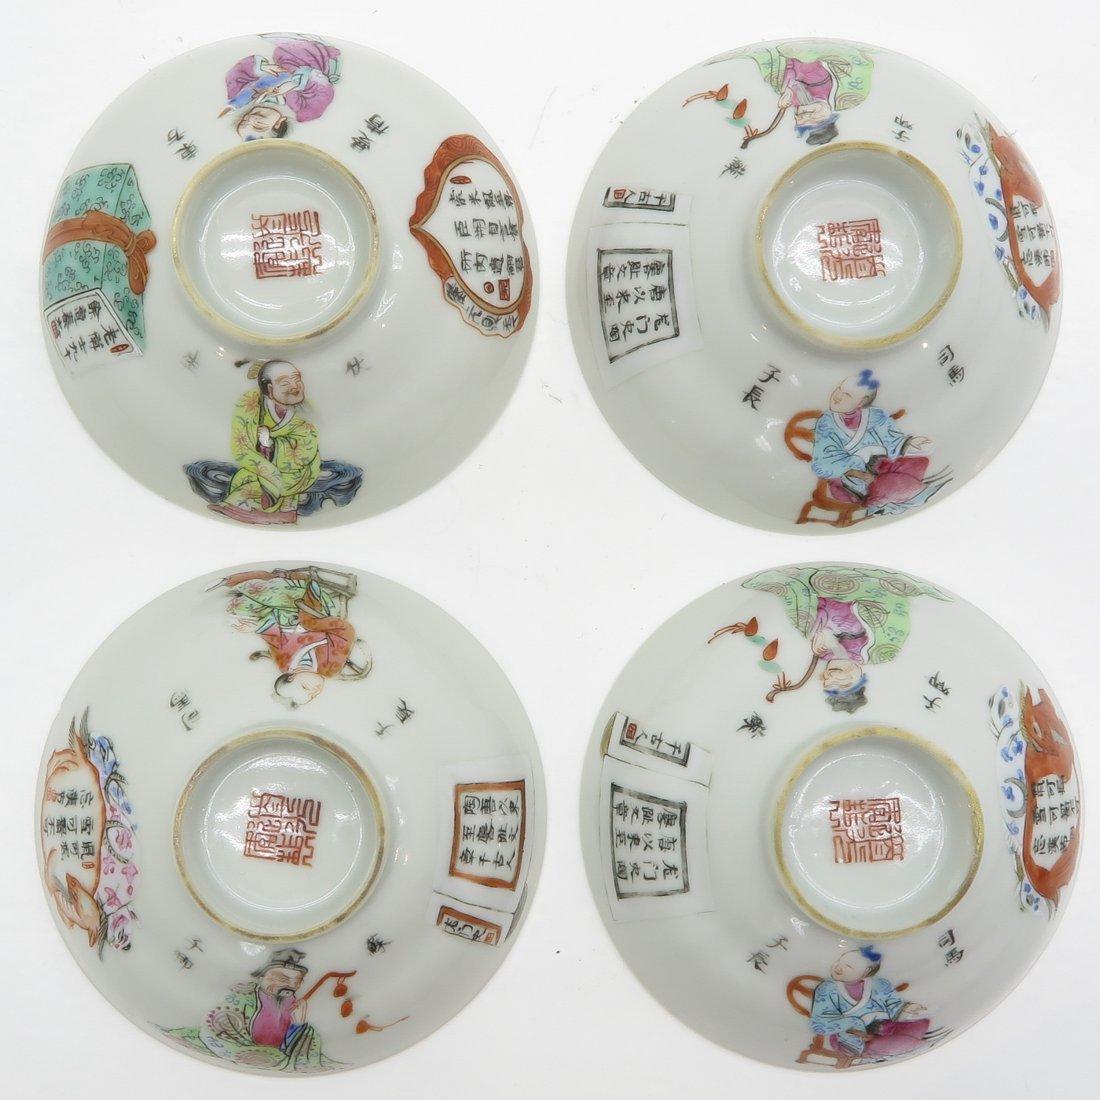 Lot of 19th Century Wu Shuang Pu Decor Items